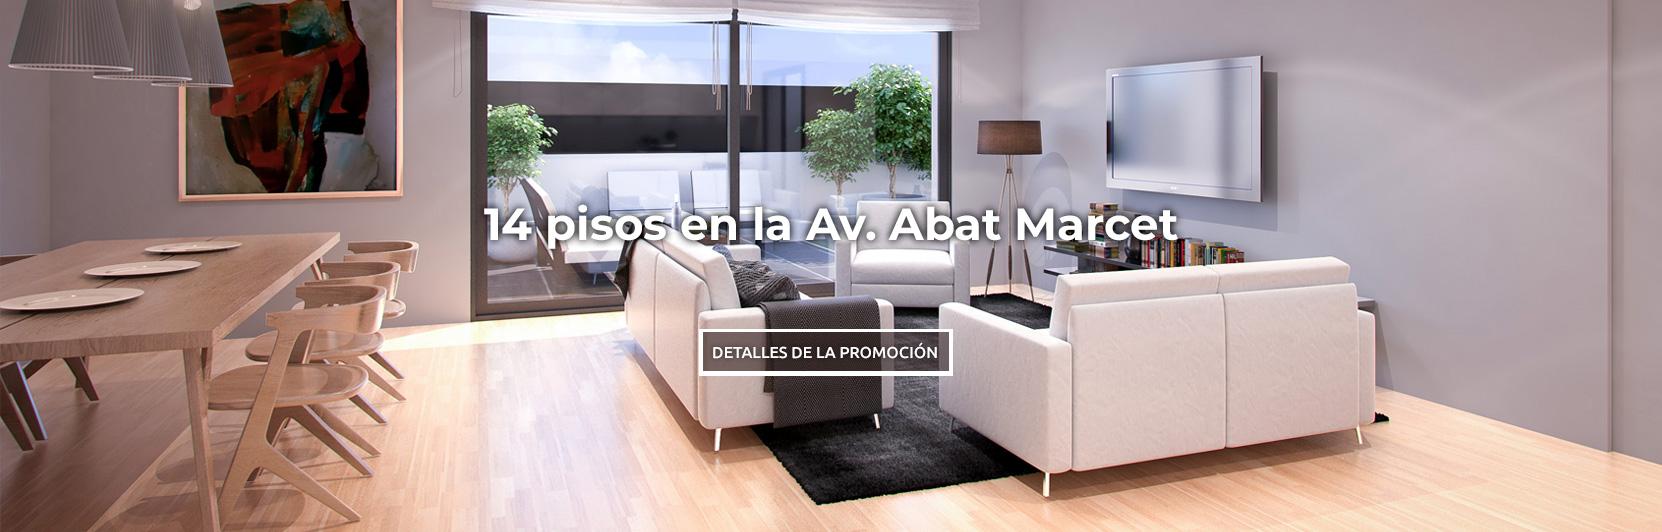 abat-marcet-terrassa-sl1es